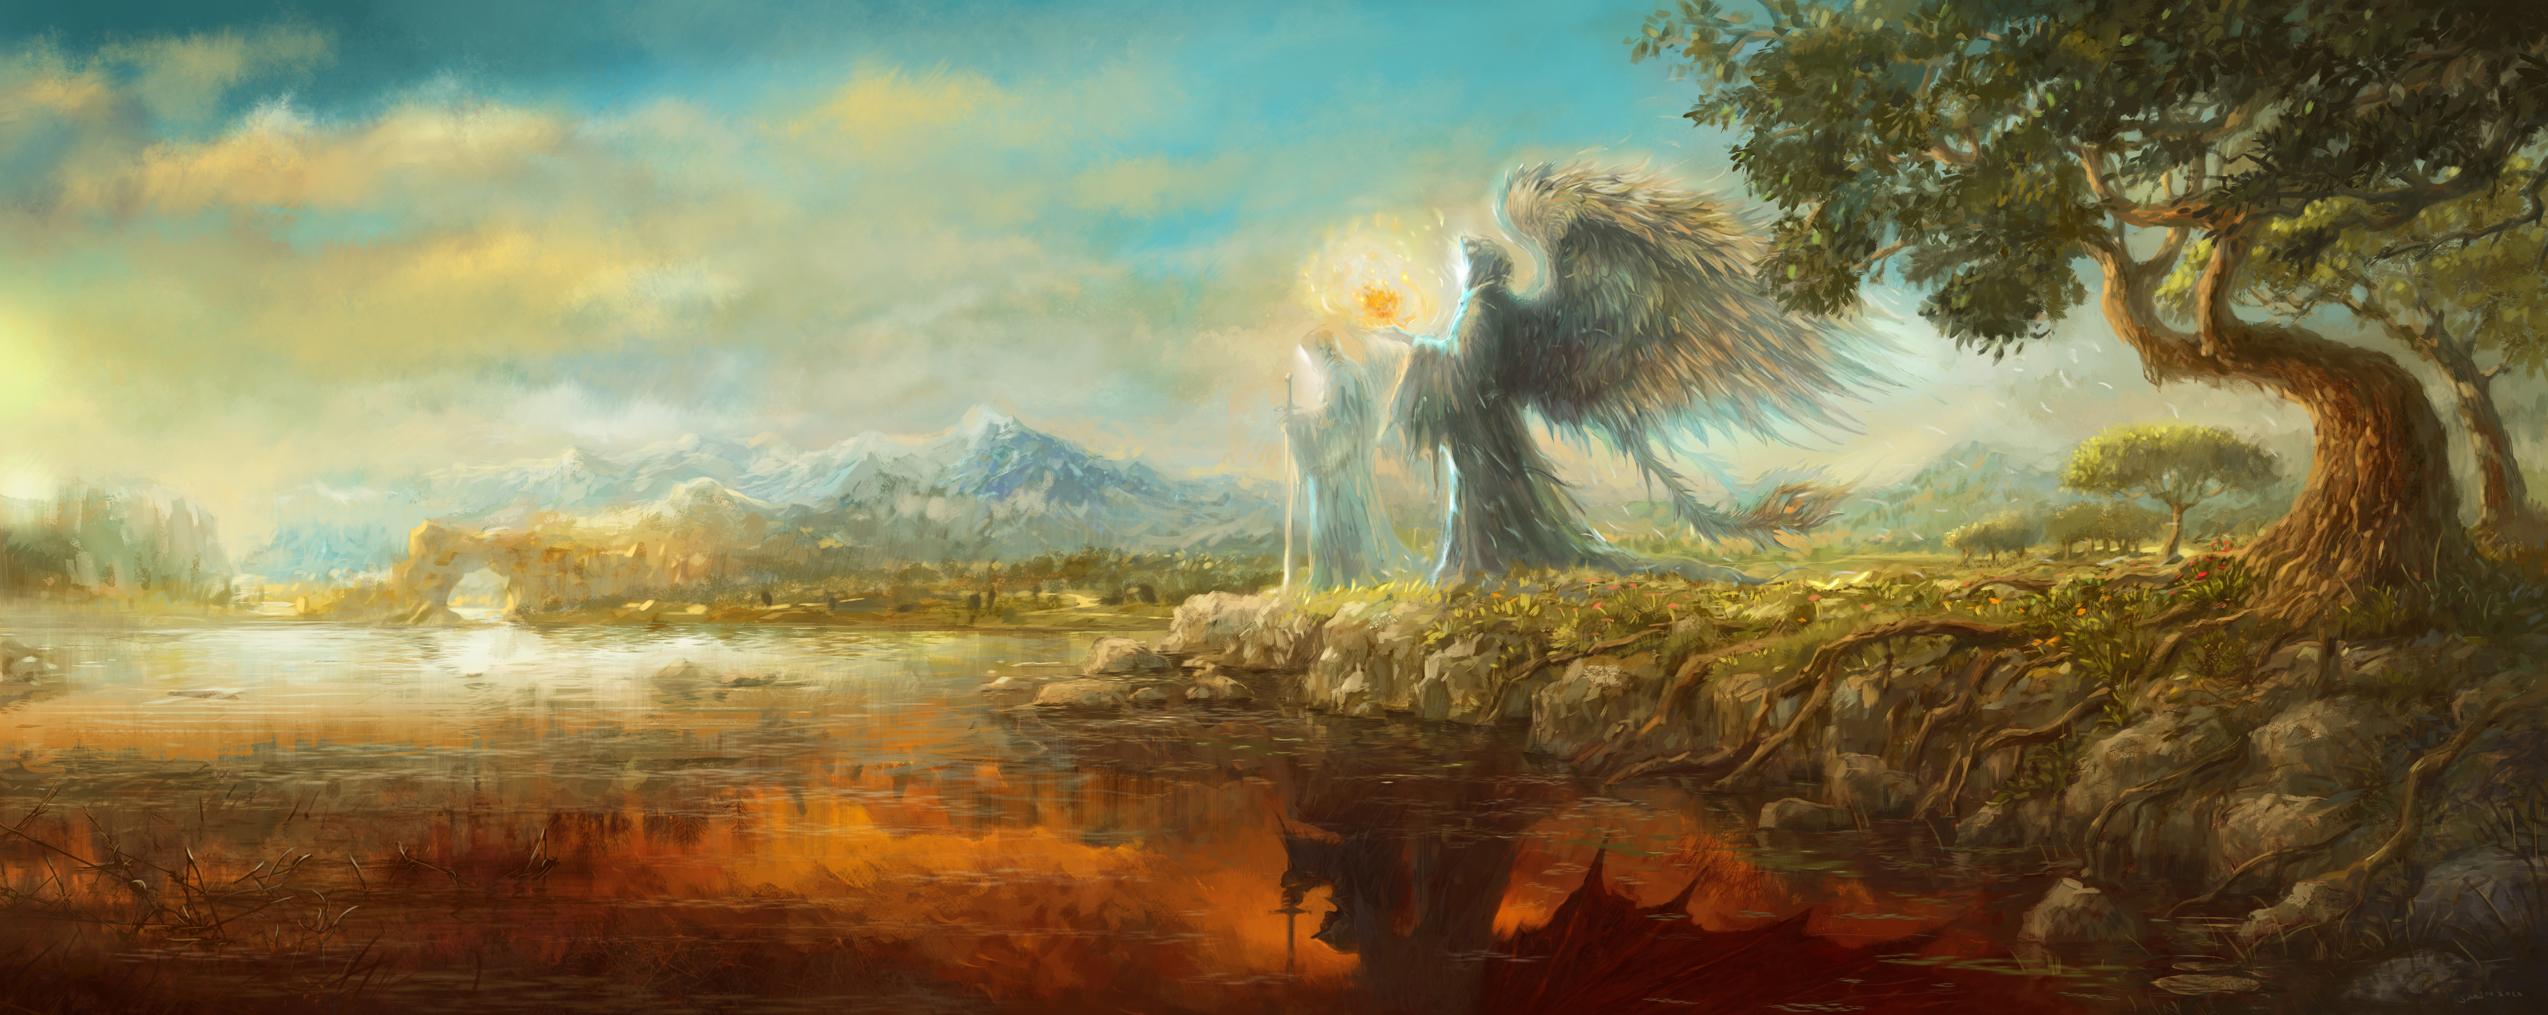 Between Heaven And Hell By Sabin Boykinov On DeviantArt